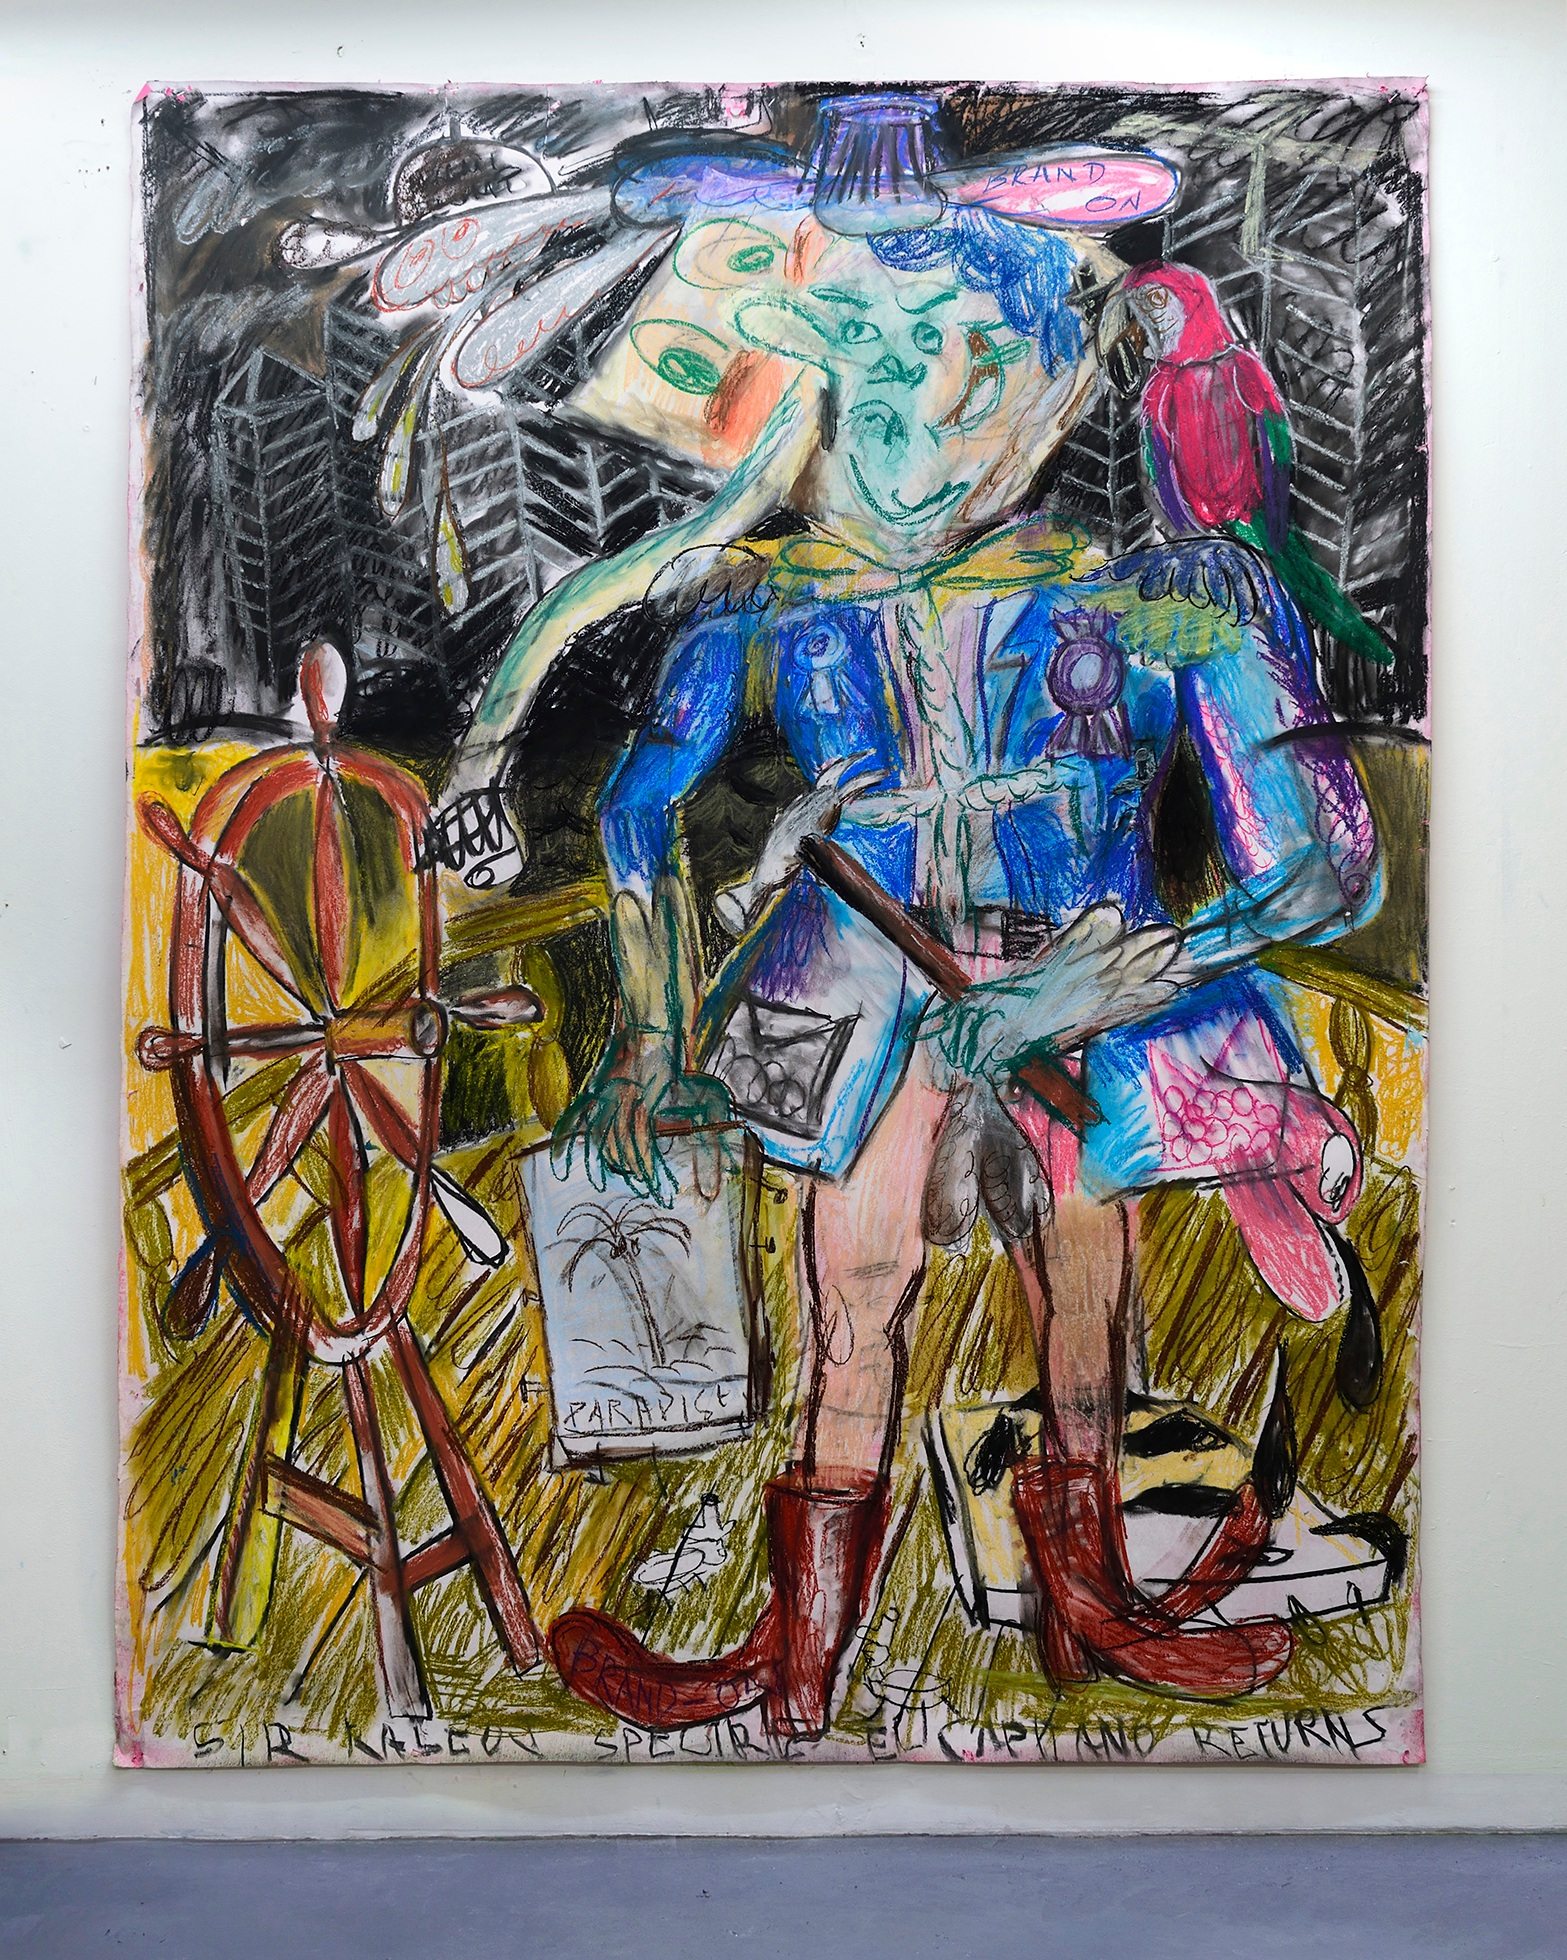 'El Capitan Talisman strikes back (Brand On) 2019   Charcoal and pastel on paper. 200 x 150 cm